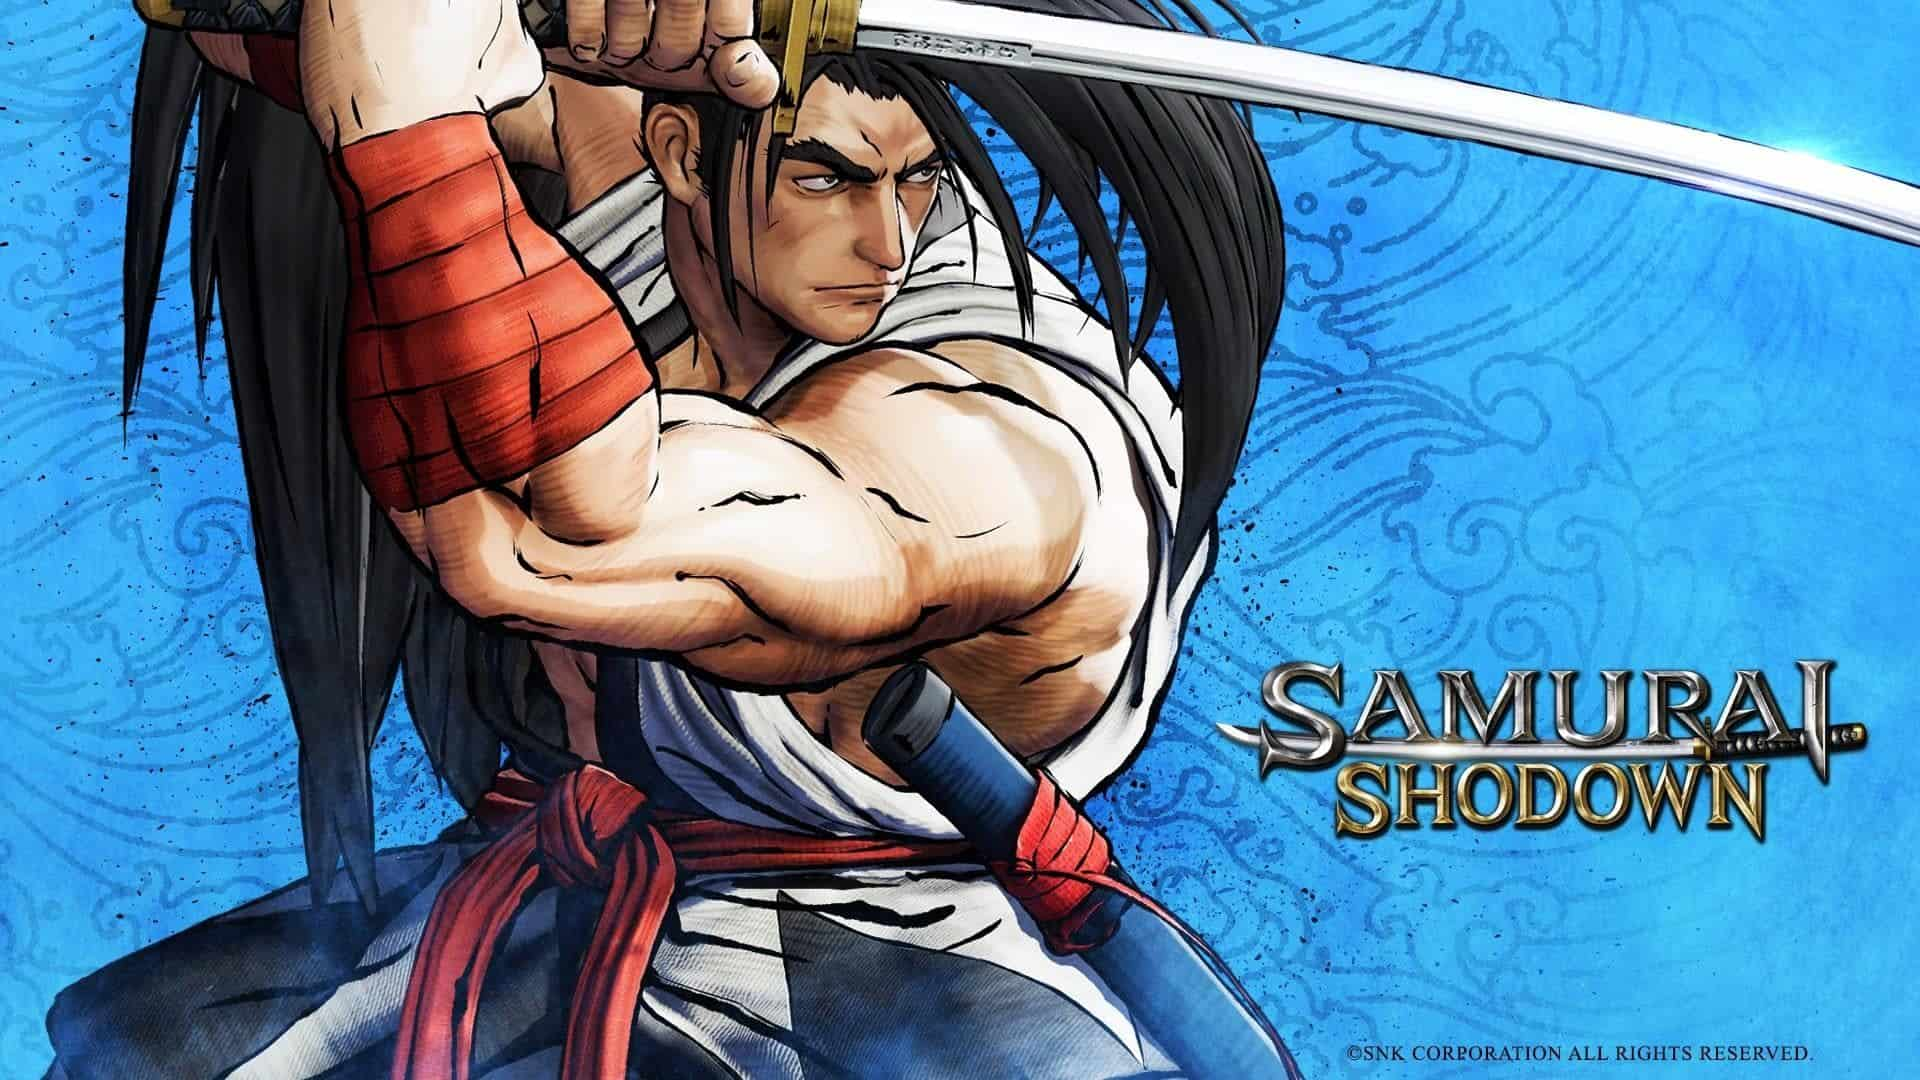 Best Fighting Games - Samurai Showdown